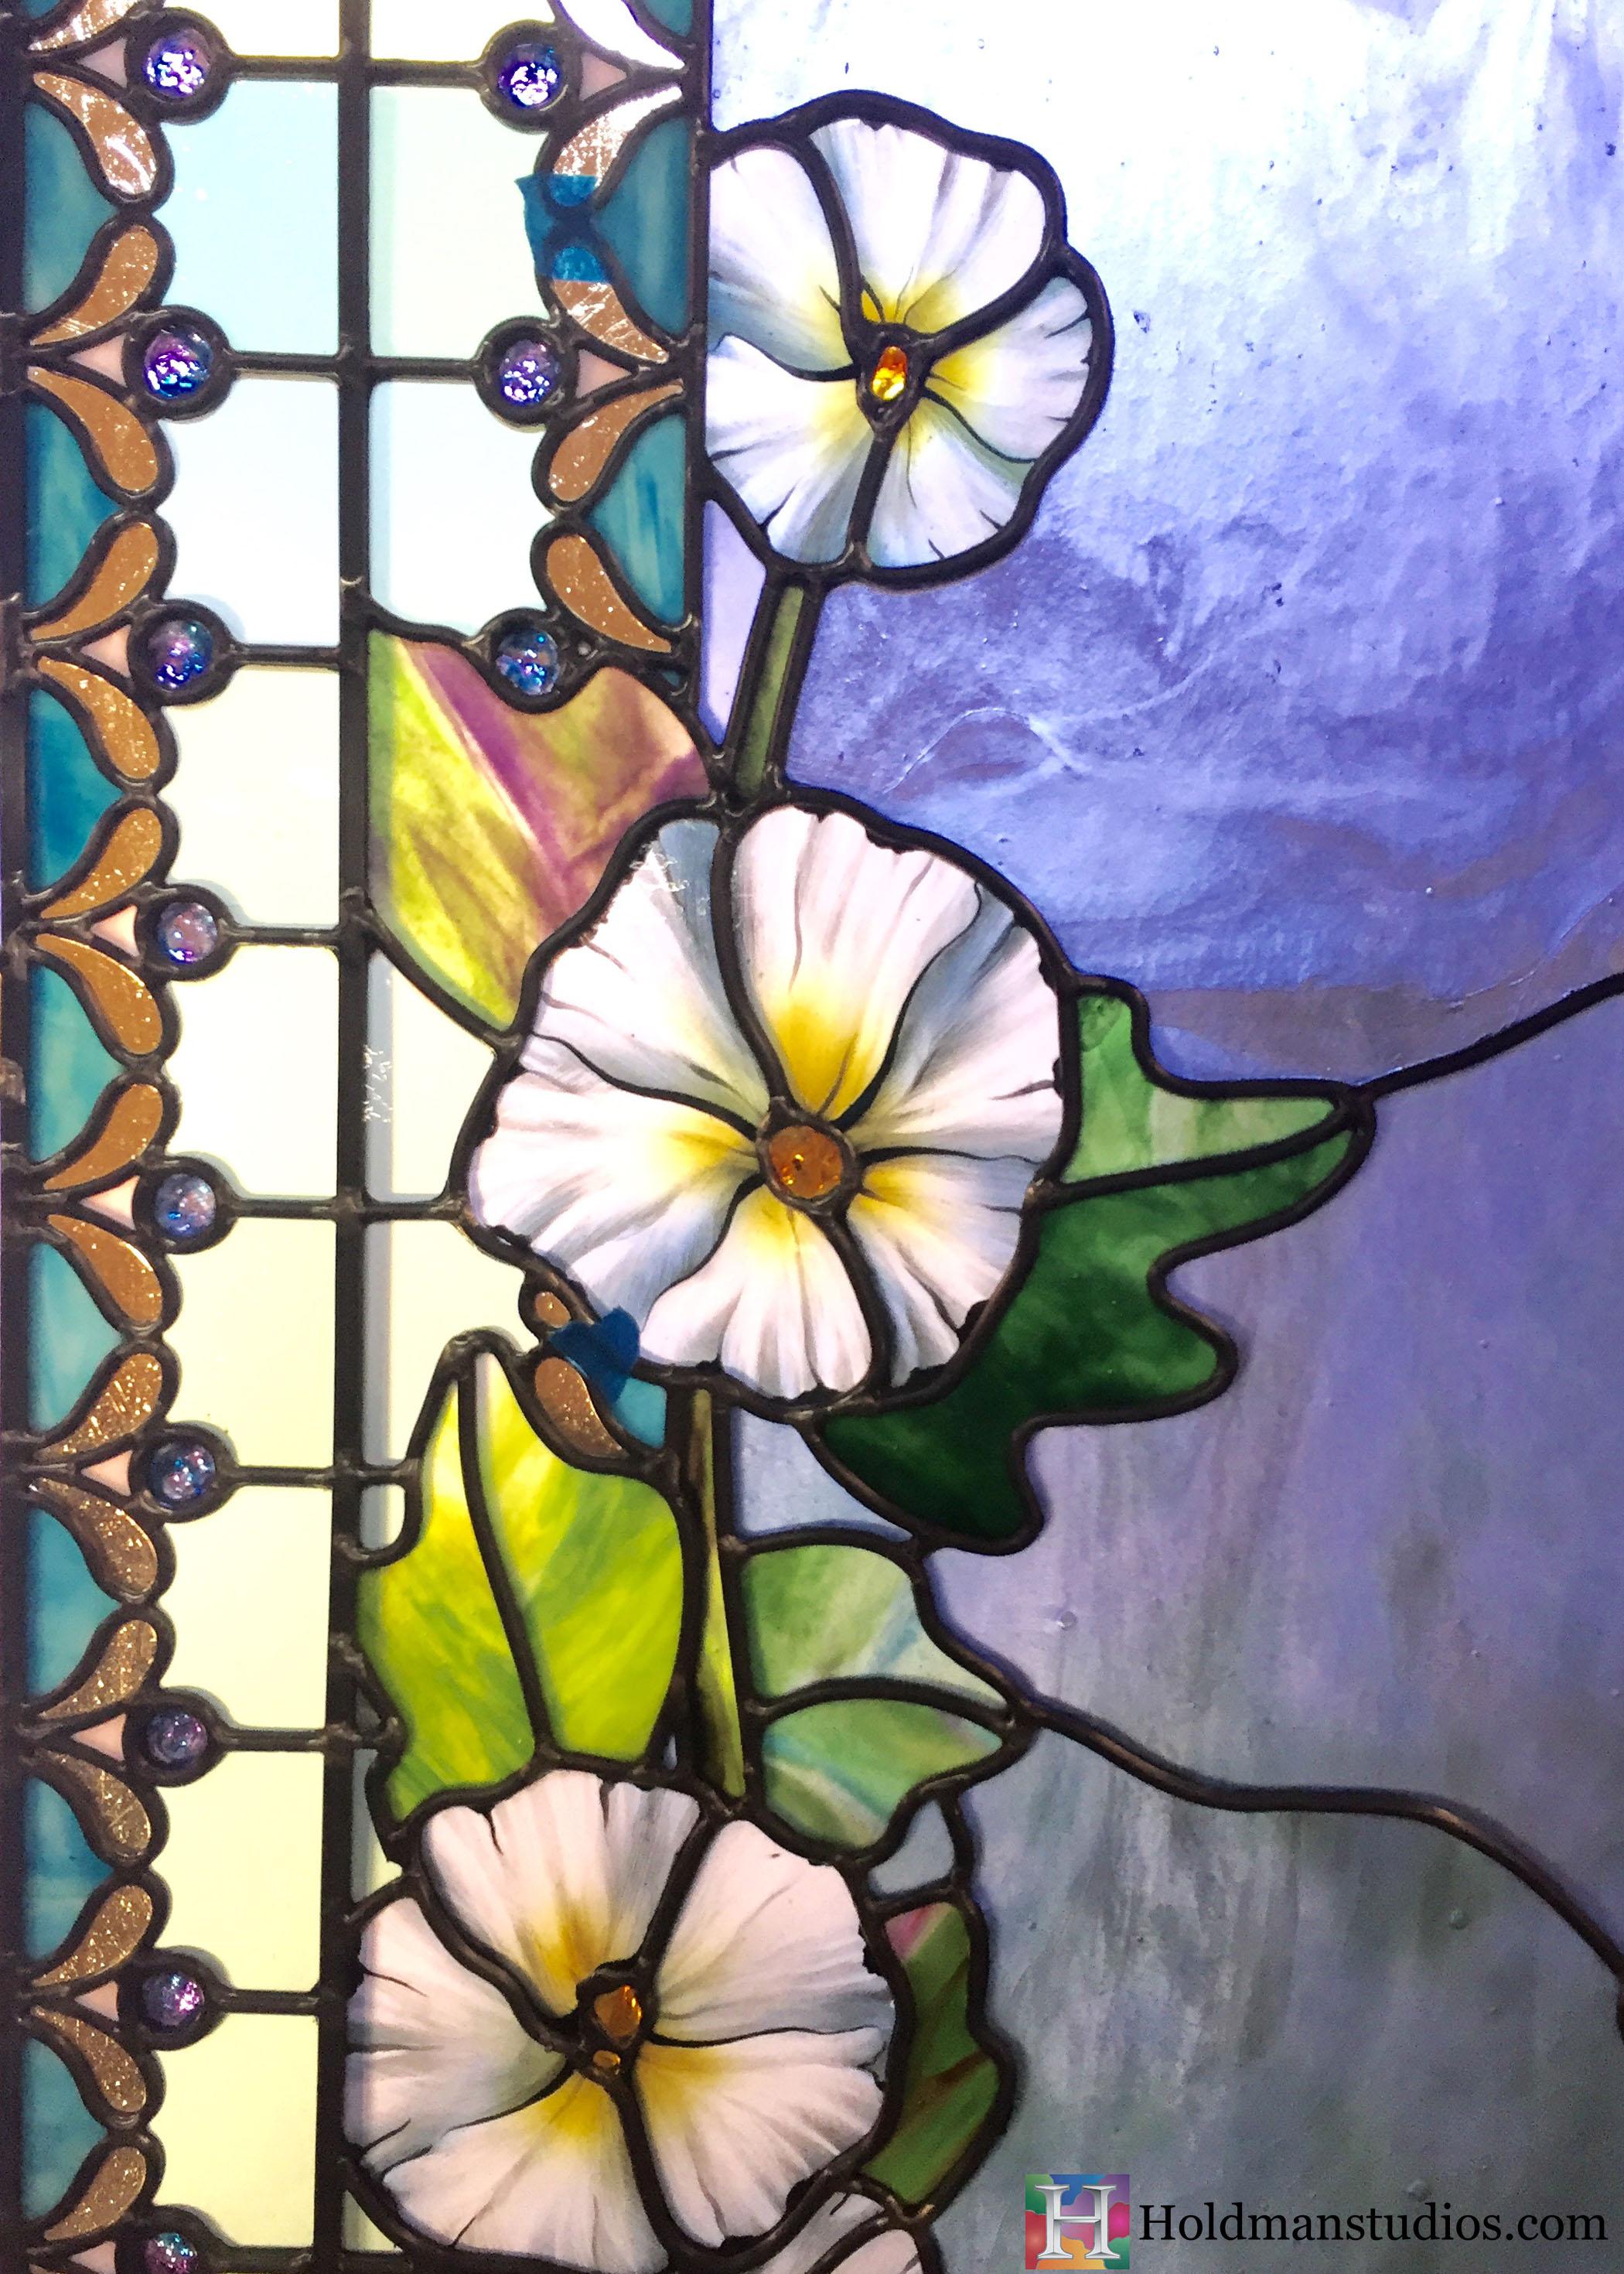 Holdman-Studios-Stained-Glass-Paris-LDS-Temple-Cornflower-Blue-Lily-Flowers-Leaves-Windows-Crop.jpg